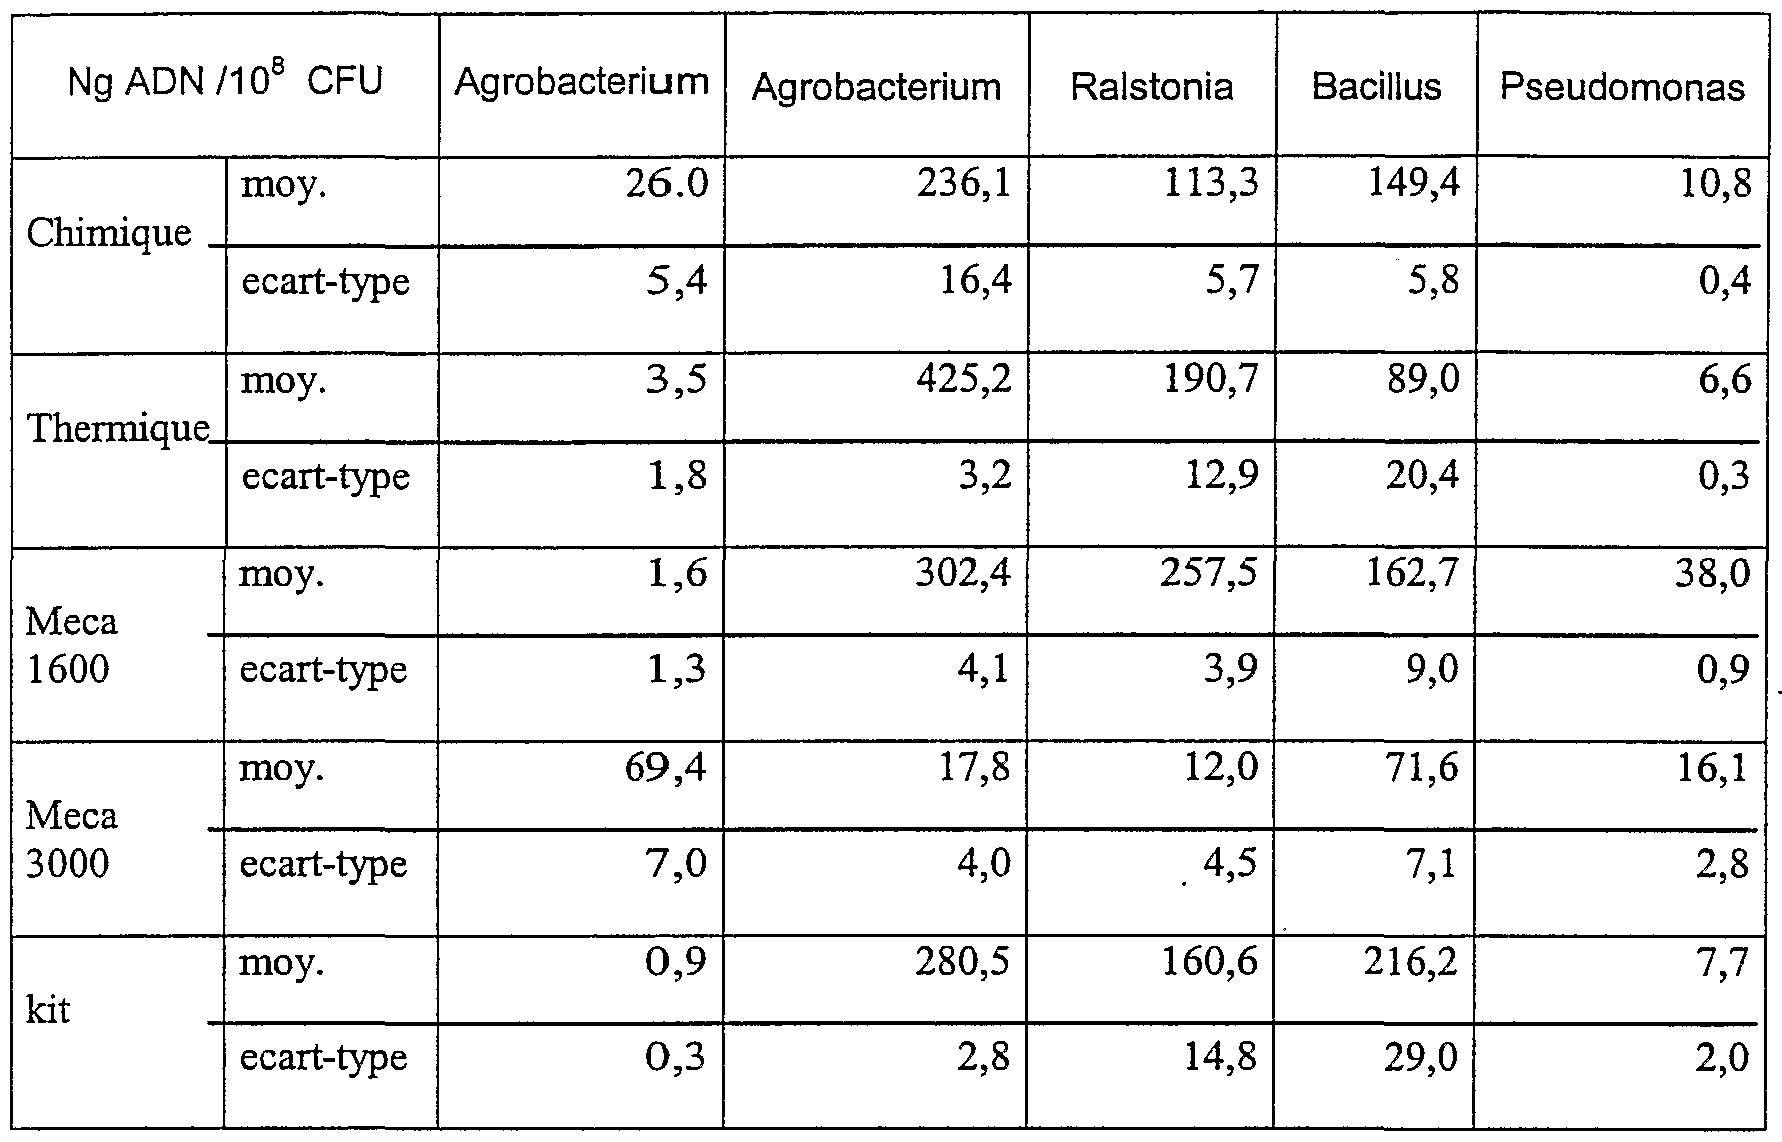 figure imgf000023_0001 - Coloration De Gram Protocole